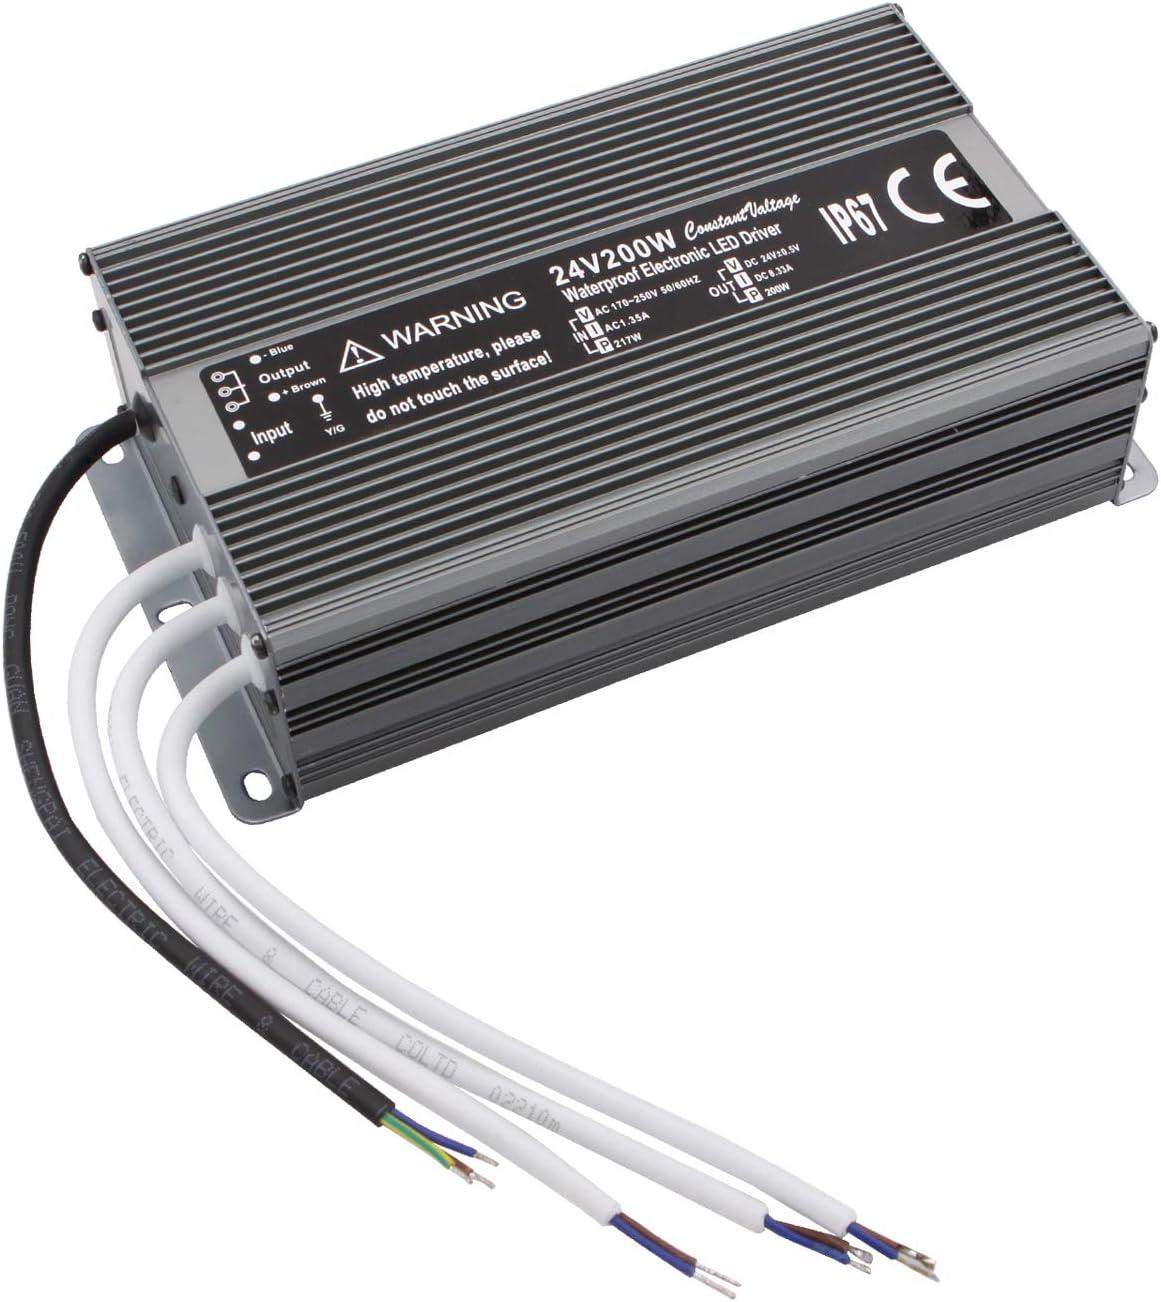 NCL Fuente de alimentación a Prueba de Agua 24V 8.33A 200W DC Transformer,100V-240V AC to24V 200W Constant Voltage LED Driver, Apply to Automation, Medical, Lamps, Instrumentation, Electric Power